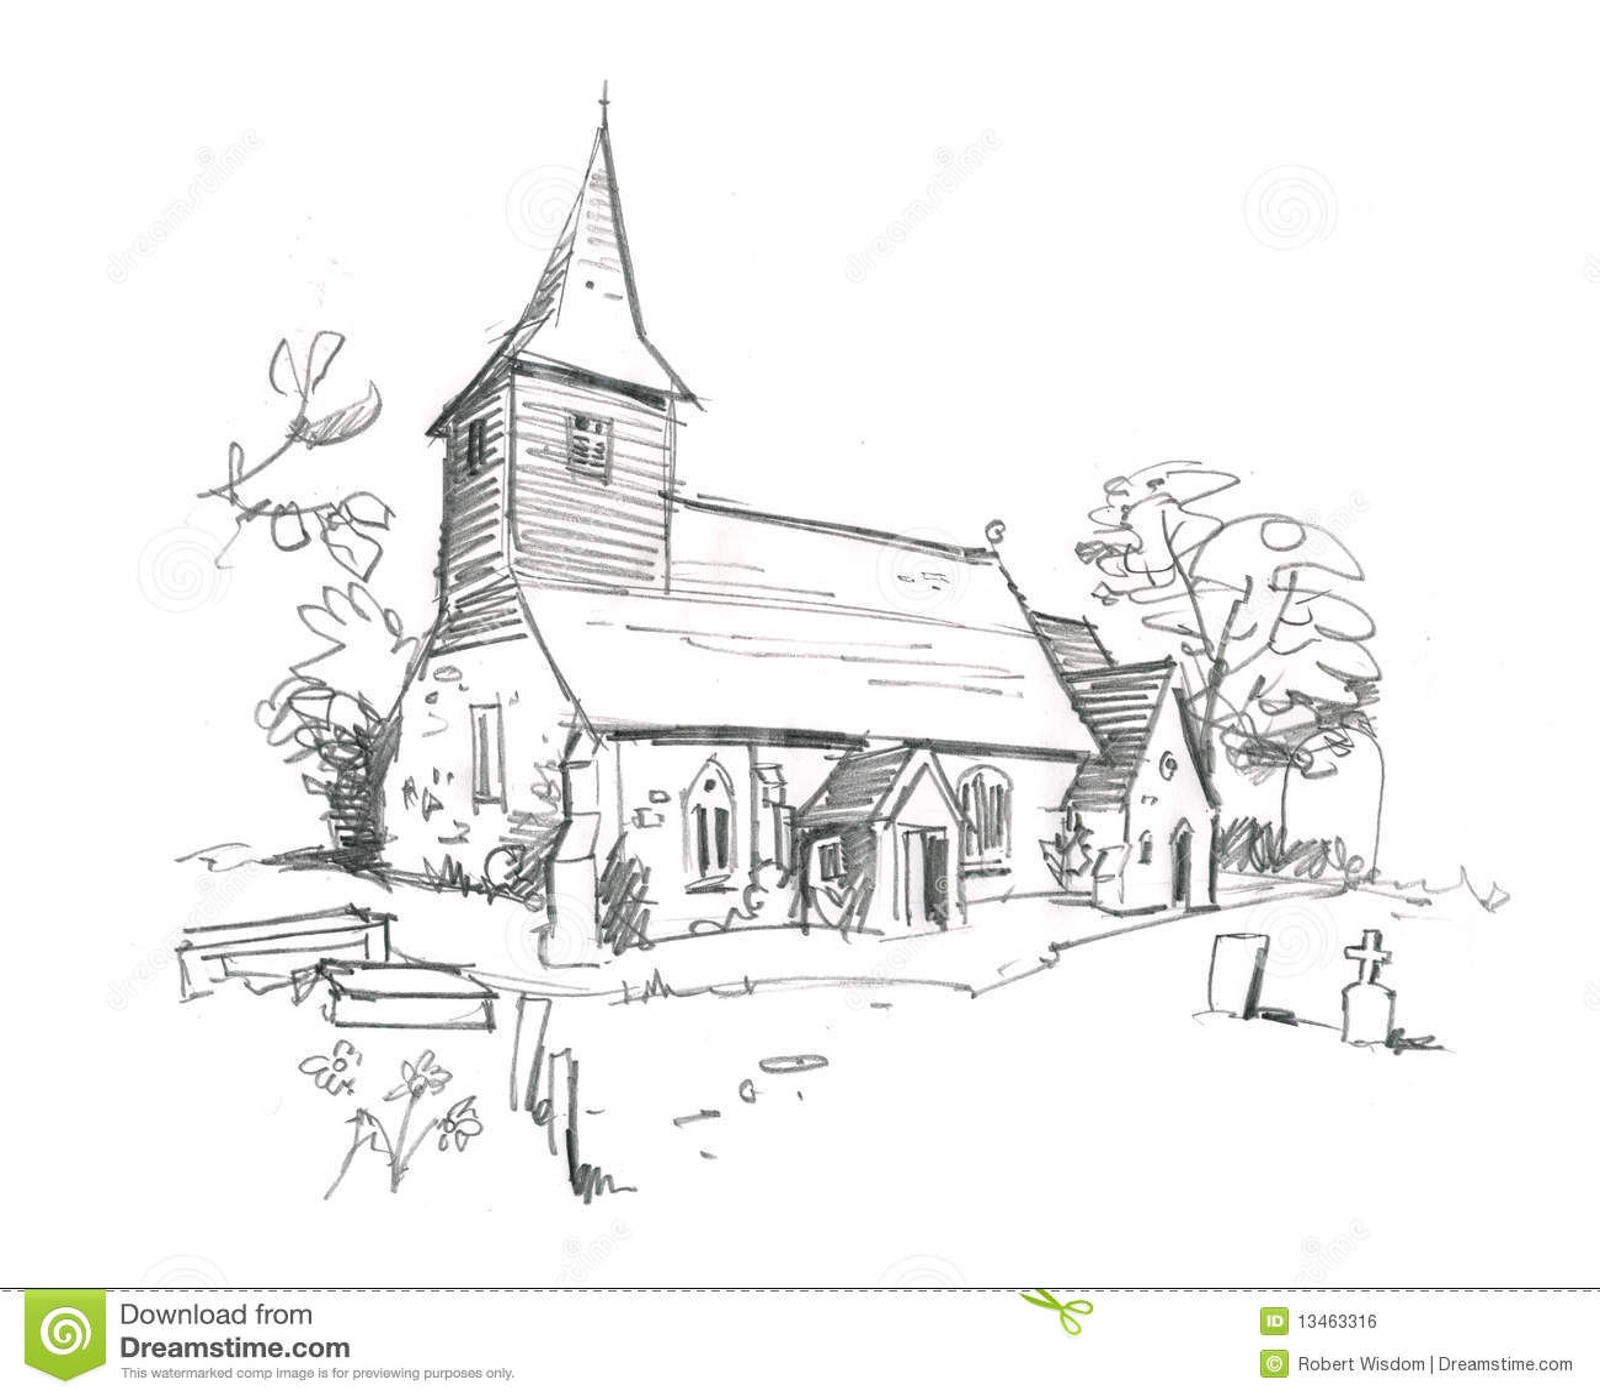 Kirche-Bleistift-Skizze stock abbildung. Illustration von peter ...